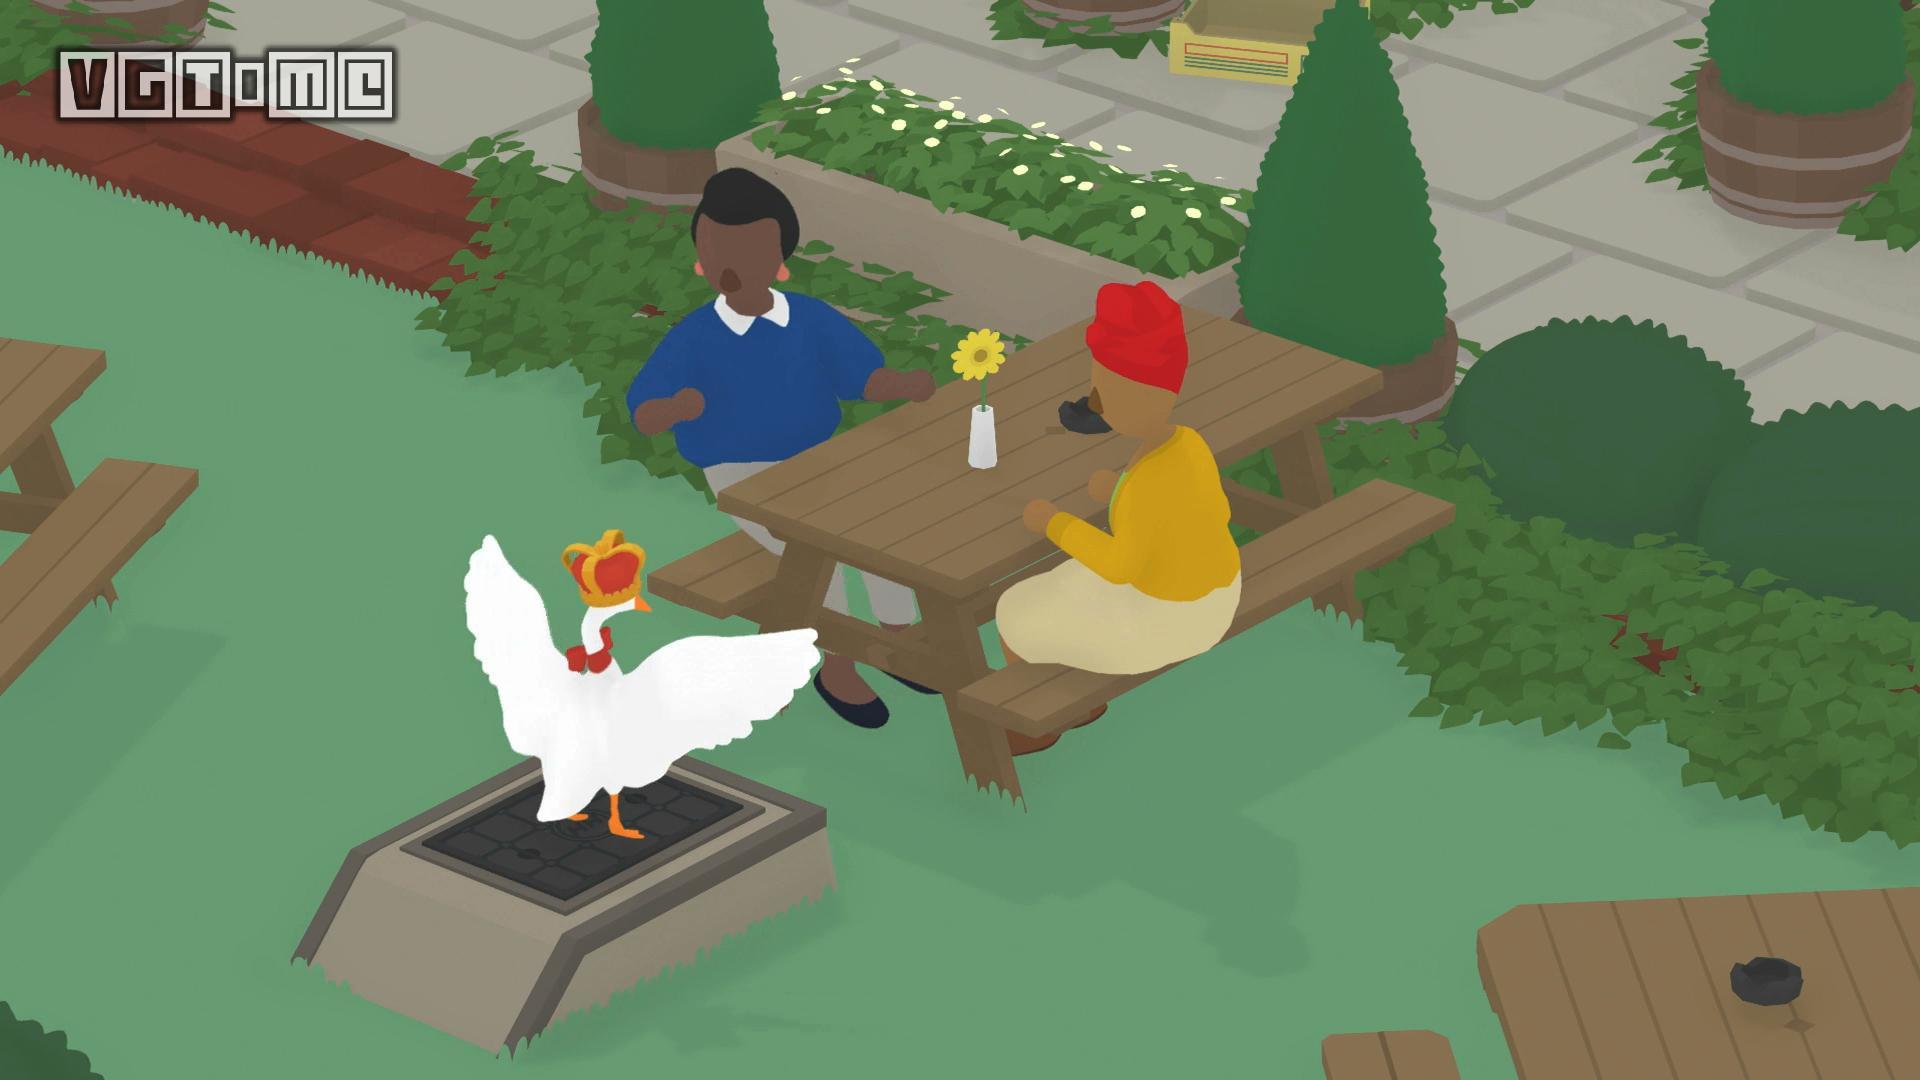 GDC 2020大奖公布 《鹅作剧》获年度游戏